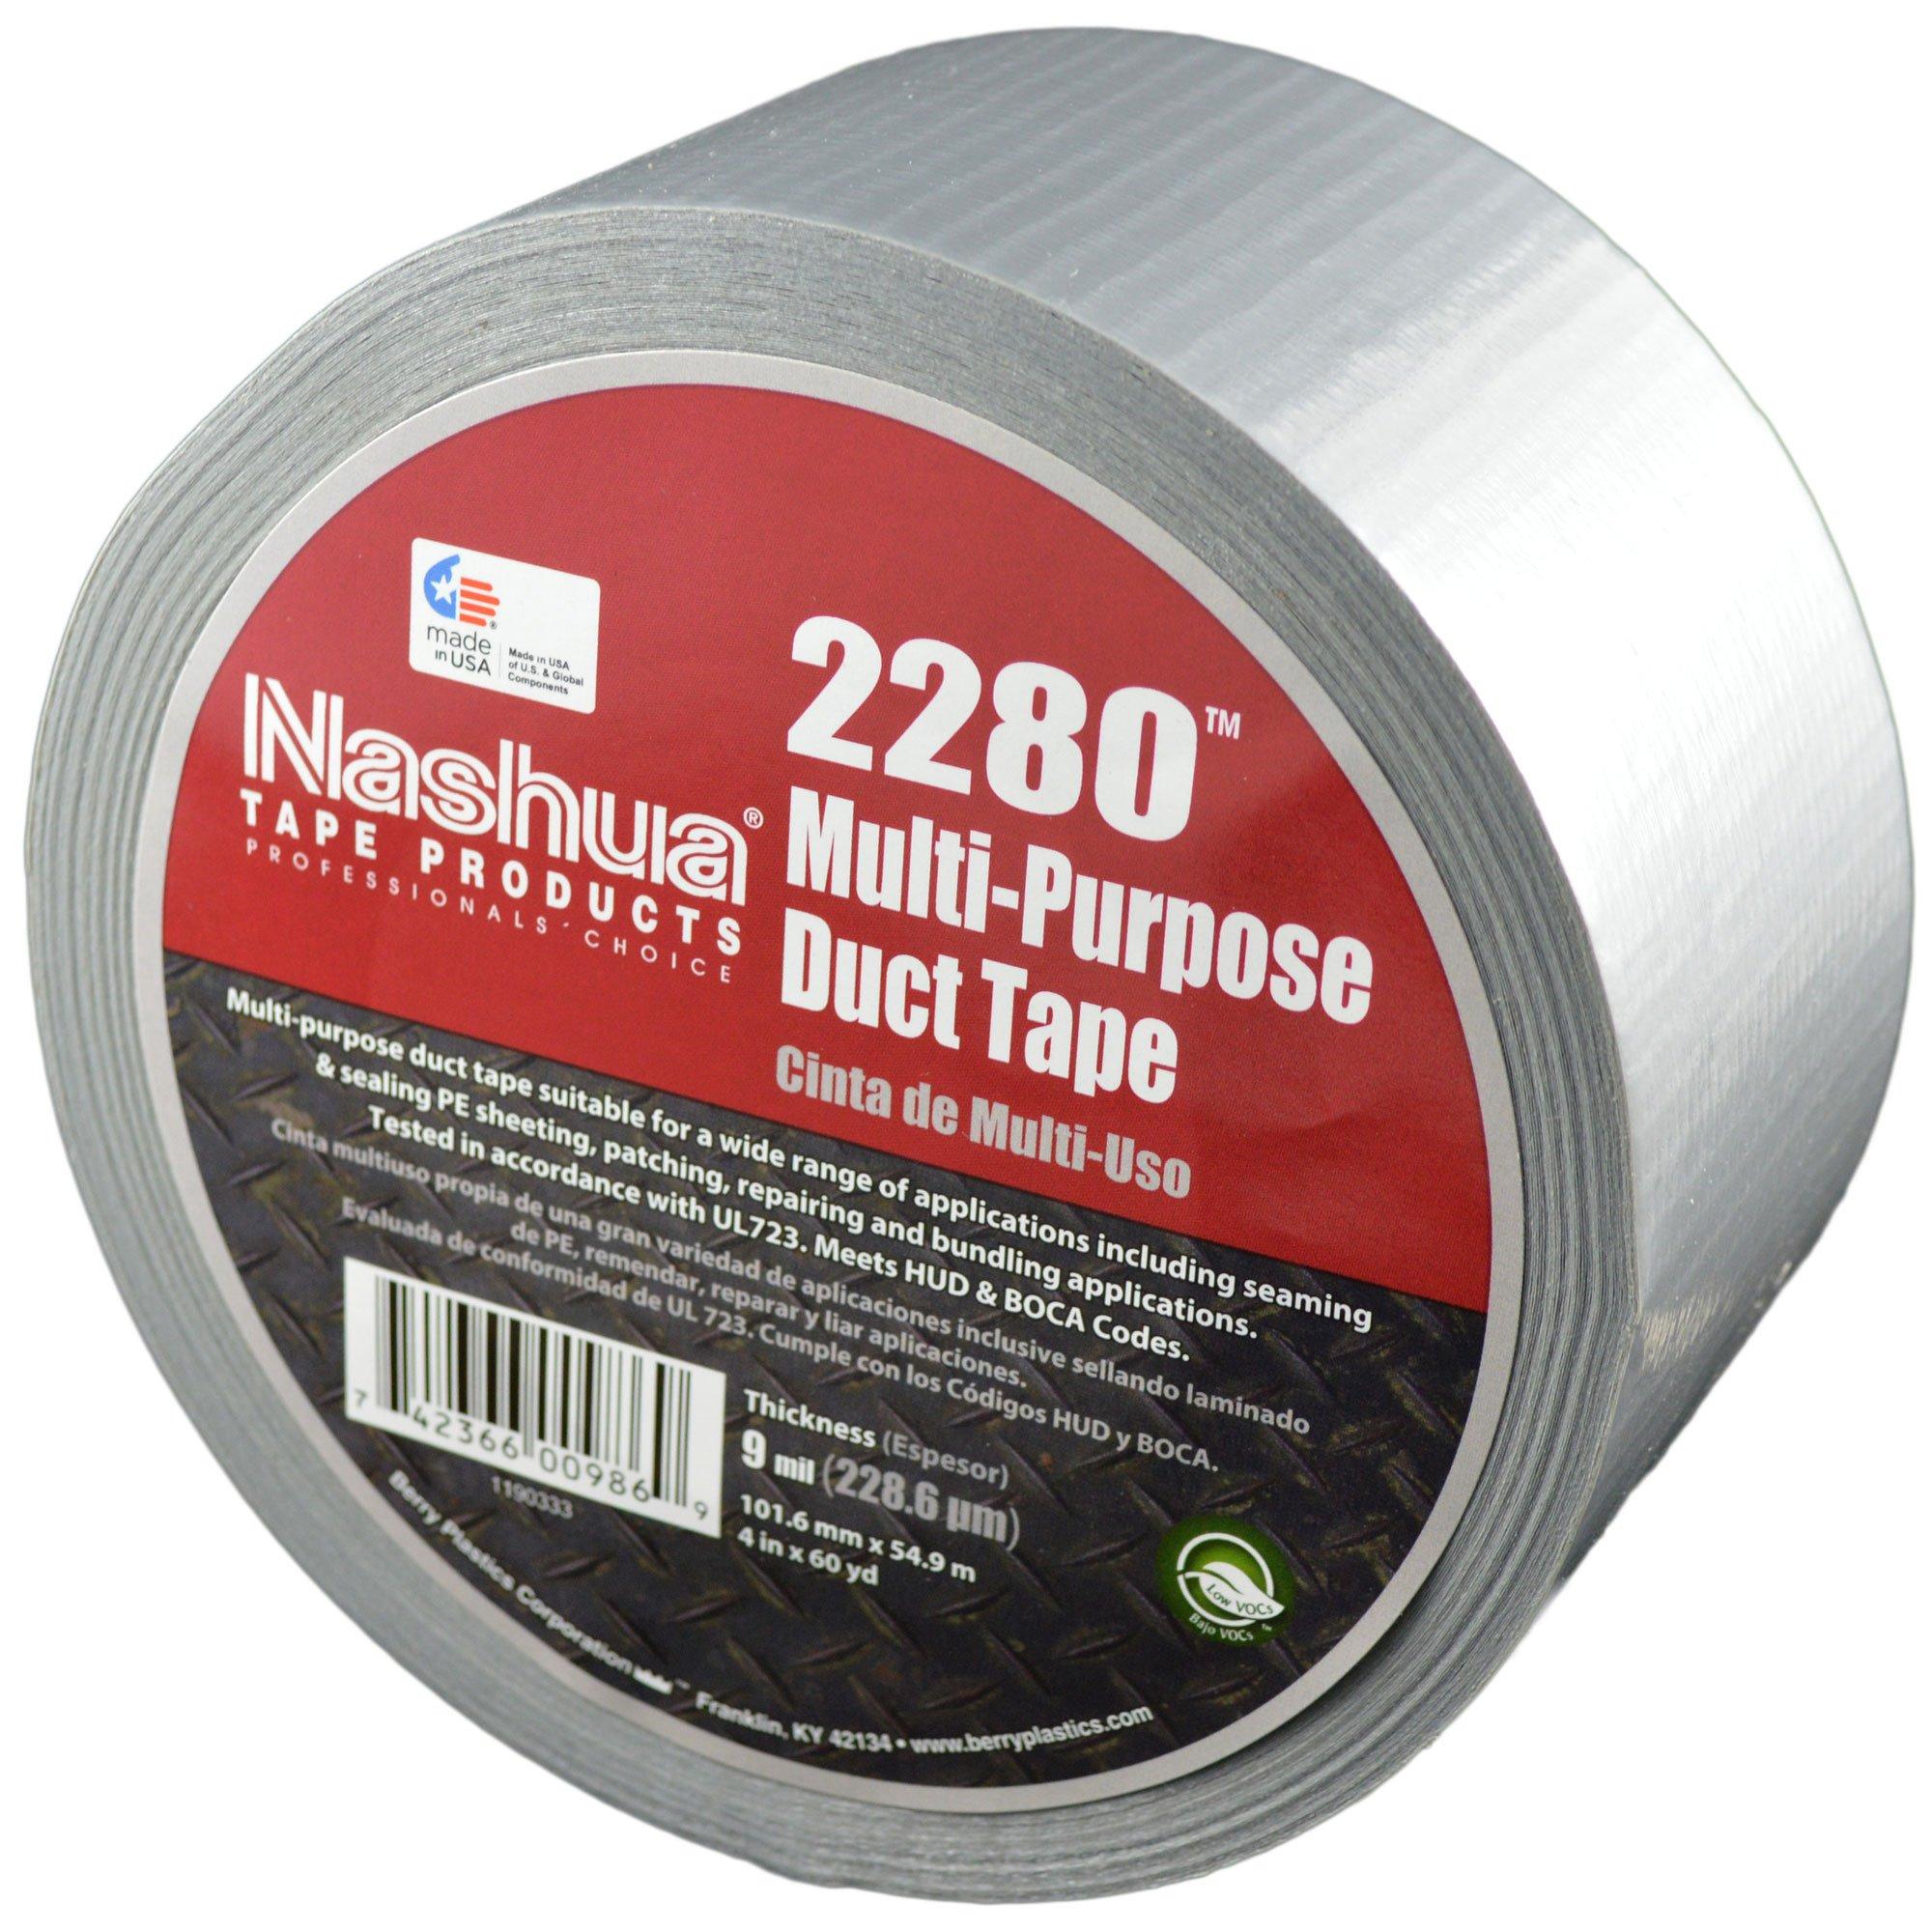 NASHUA 2280 Silver Duct Tape, Bulk Pack, Full Case, 72mm x 55M, 16 Rolls